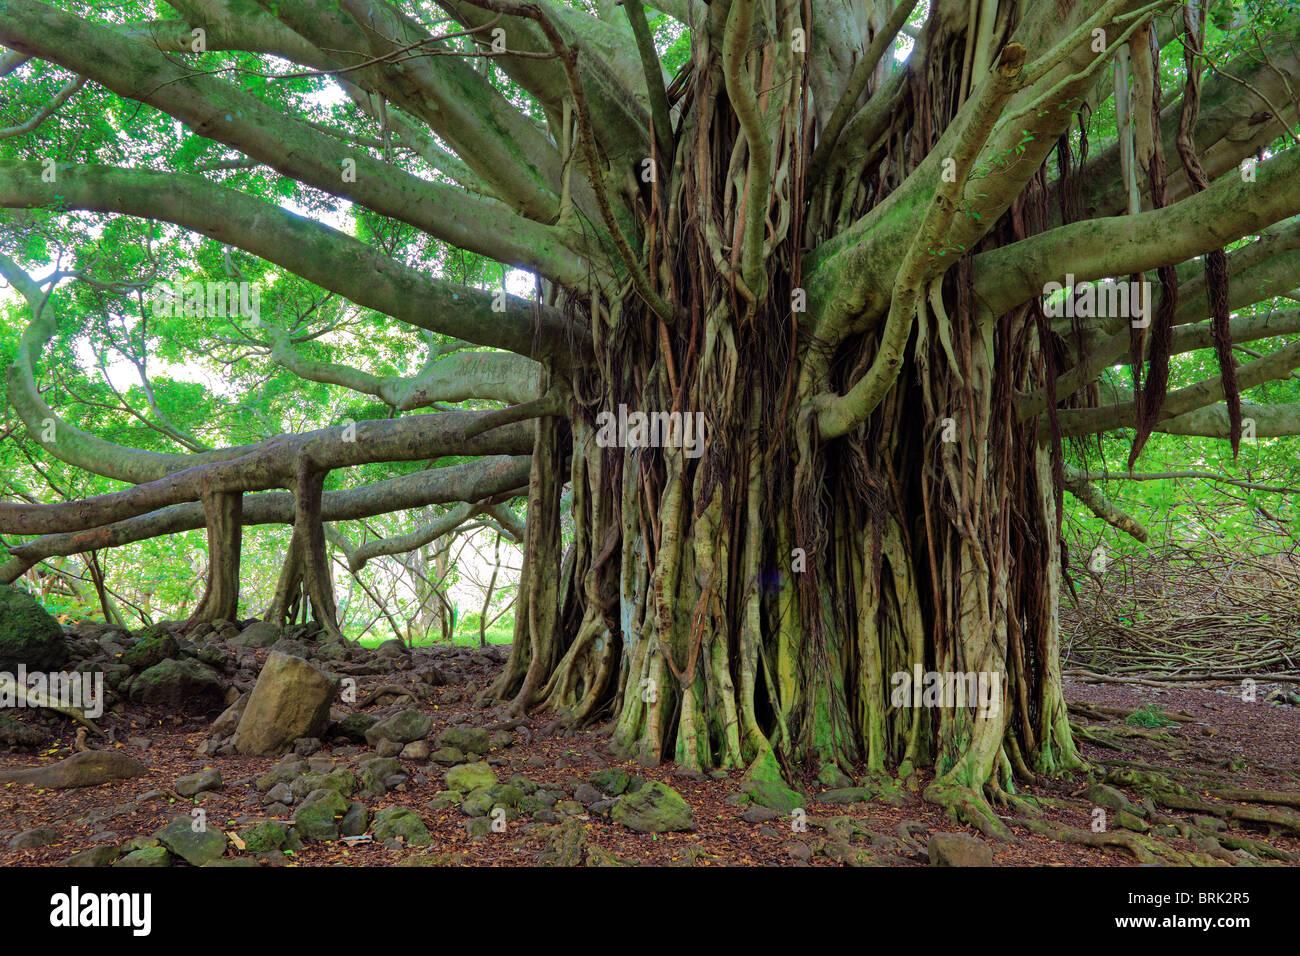 Live Wallpaper Fall Leaves Banyan Tree Along The Pipiwai Trail To Waimoku Fall In The